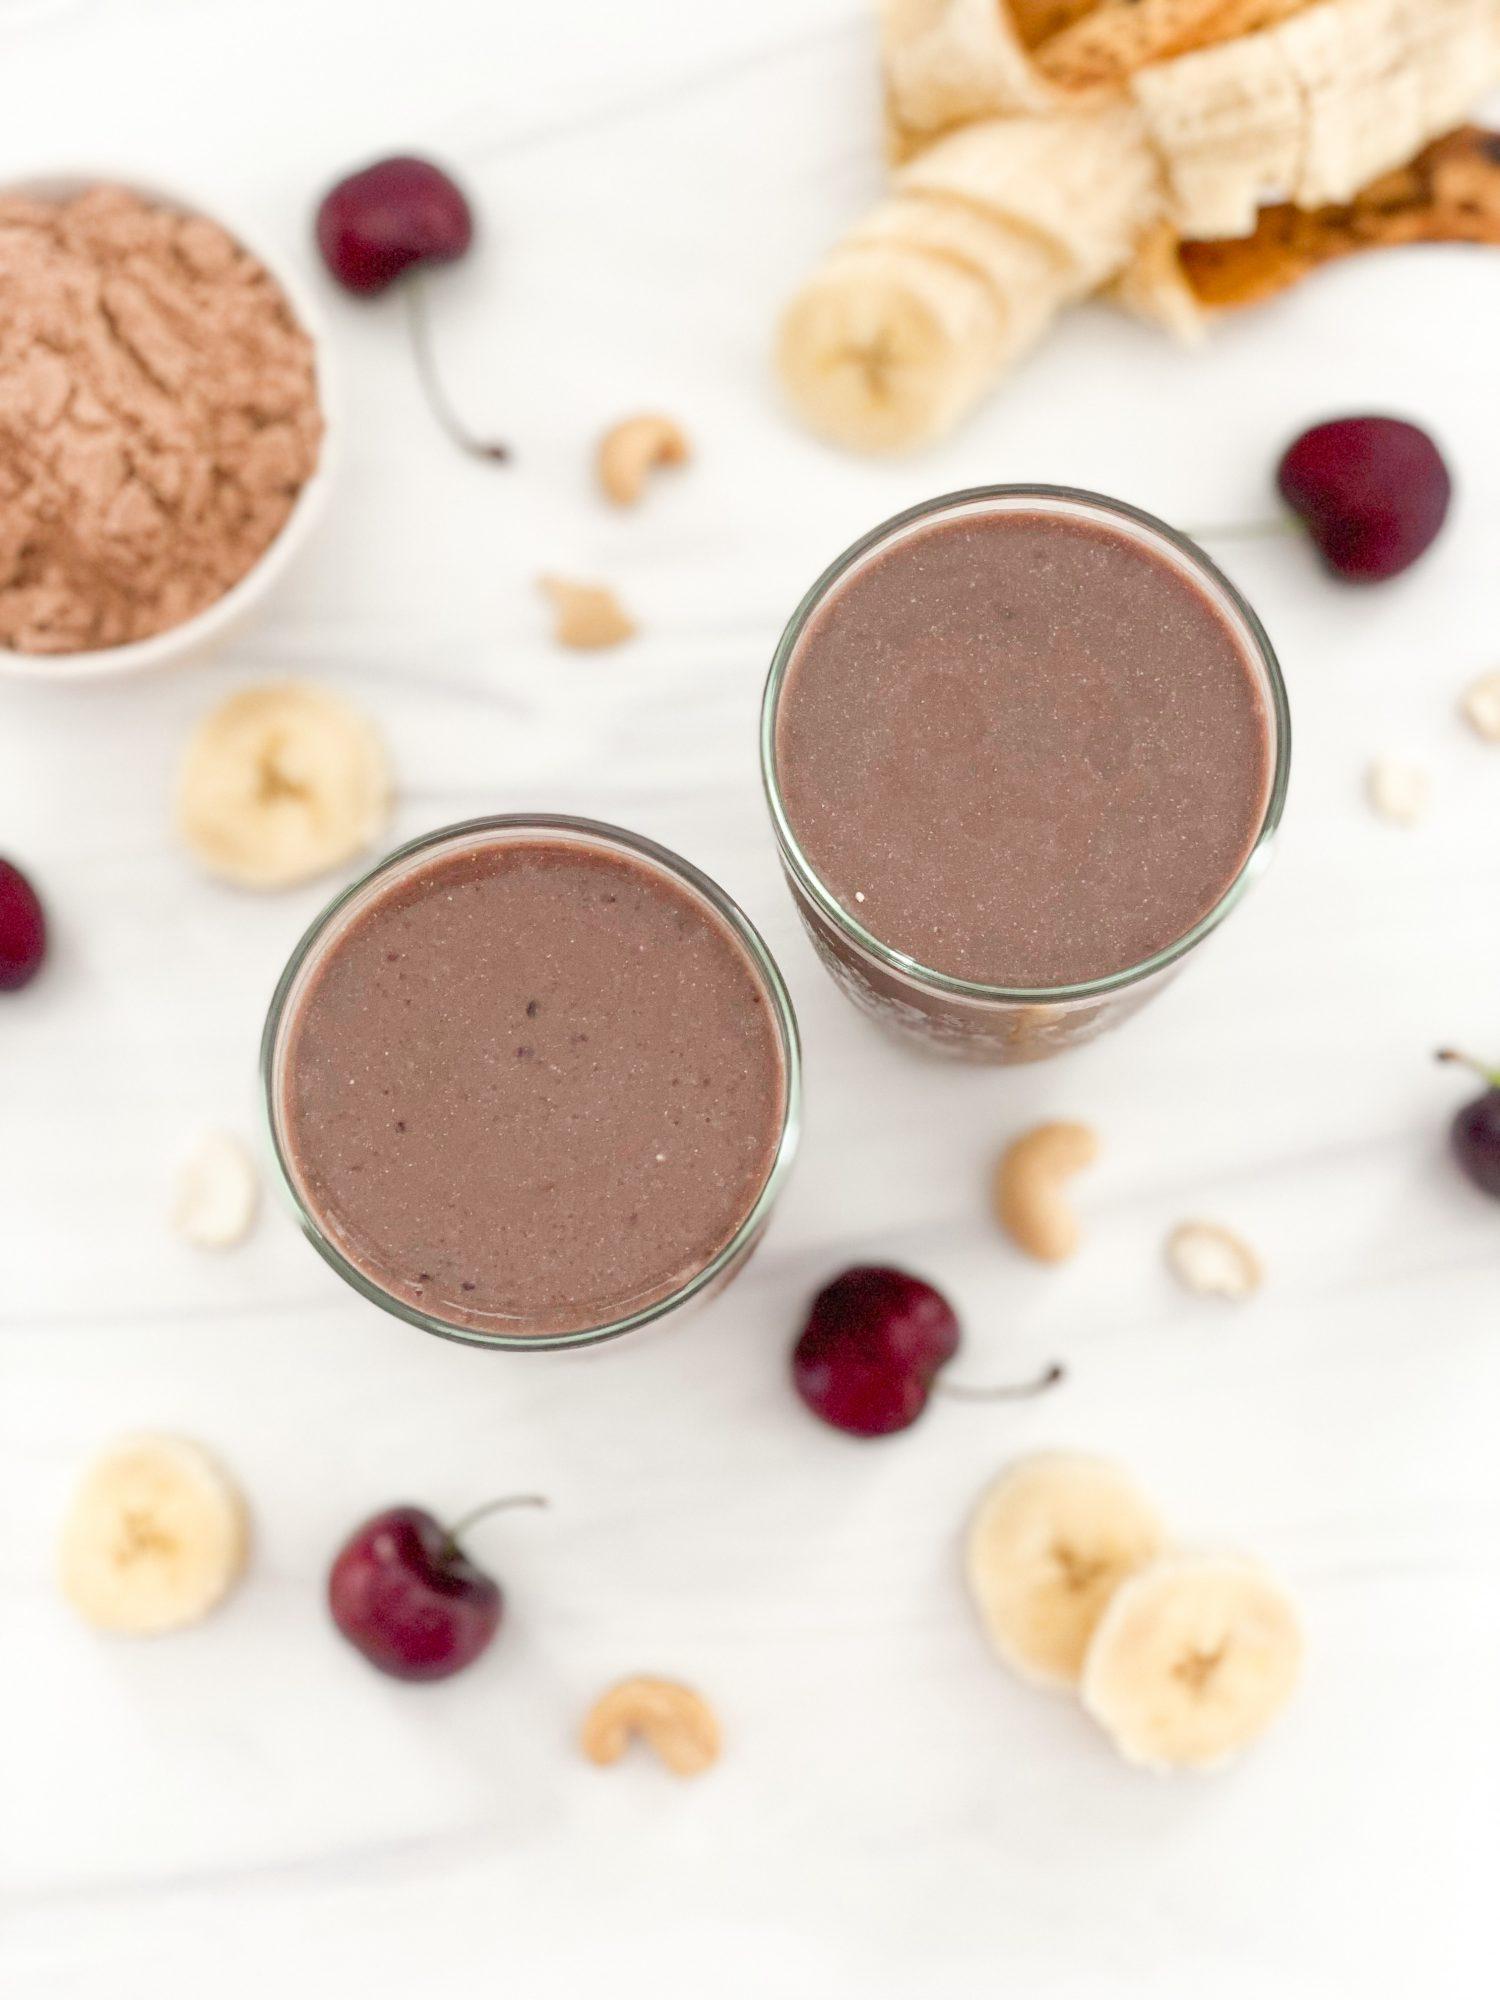 chocolate plant protein, cherry banana protein shake with ingredients around